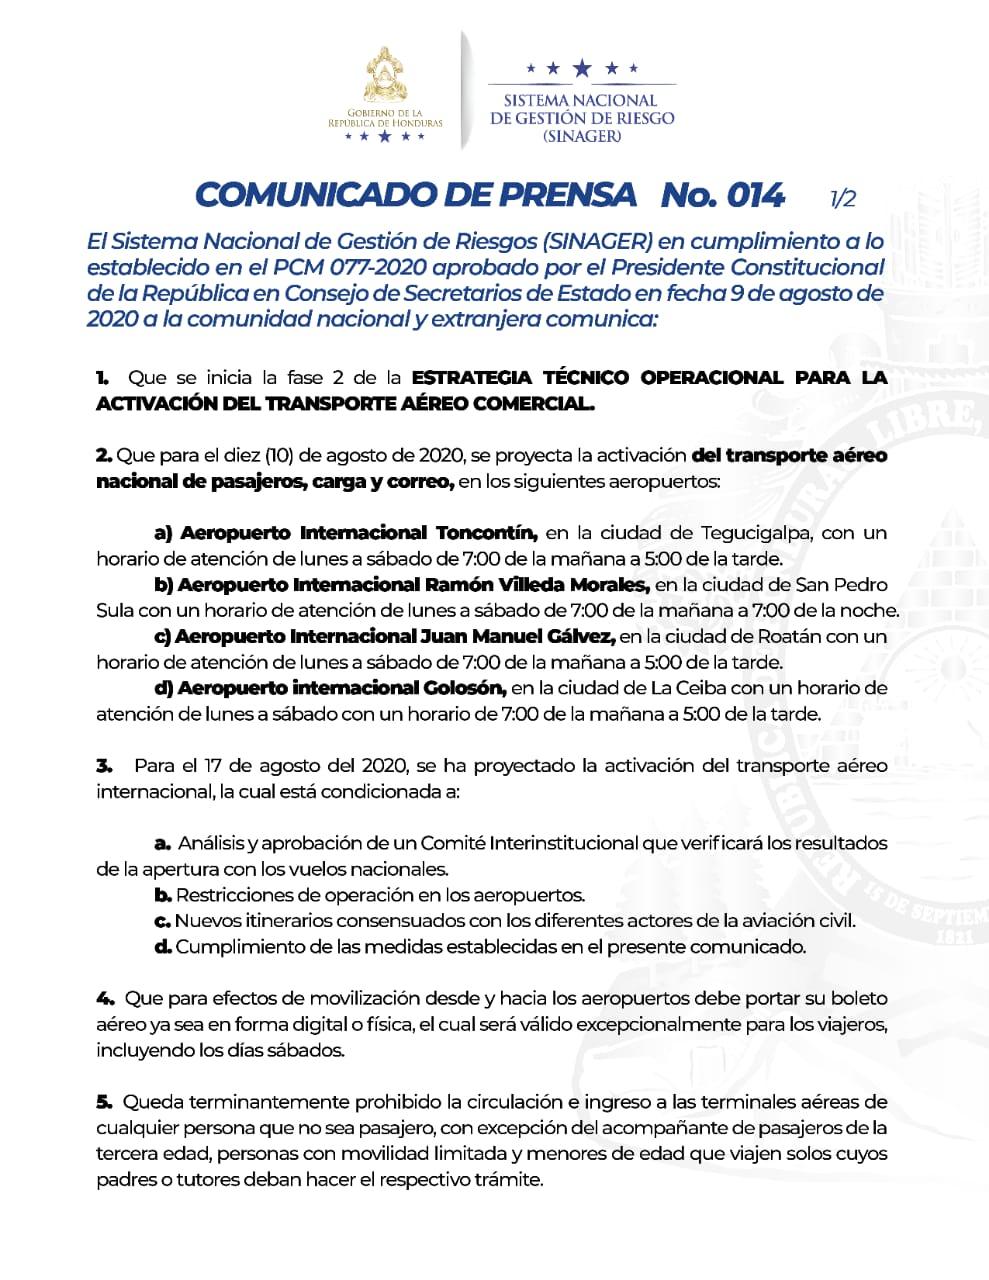 COMUNICADO: PCM 077-2020 del SINAGER